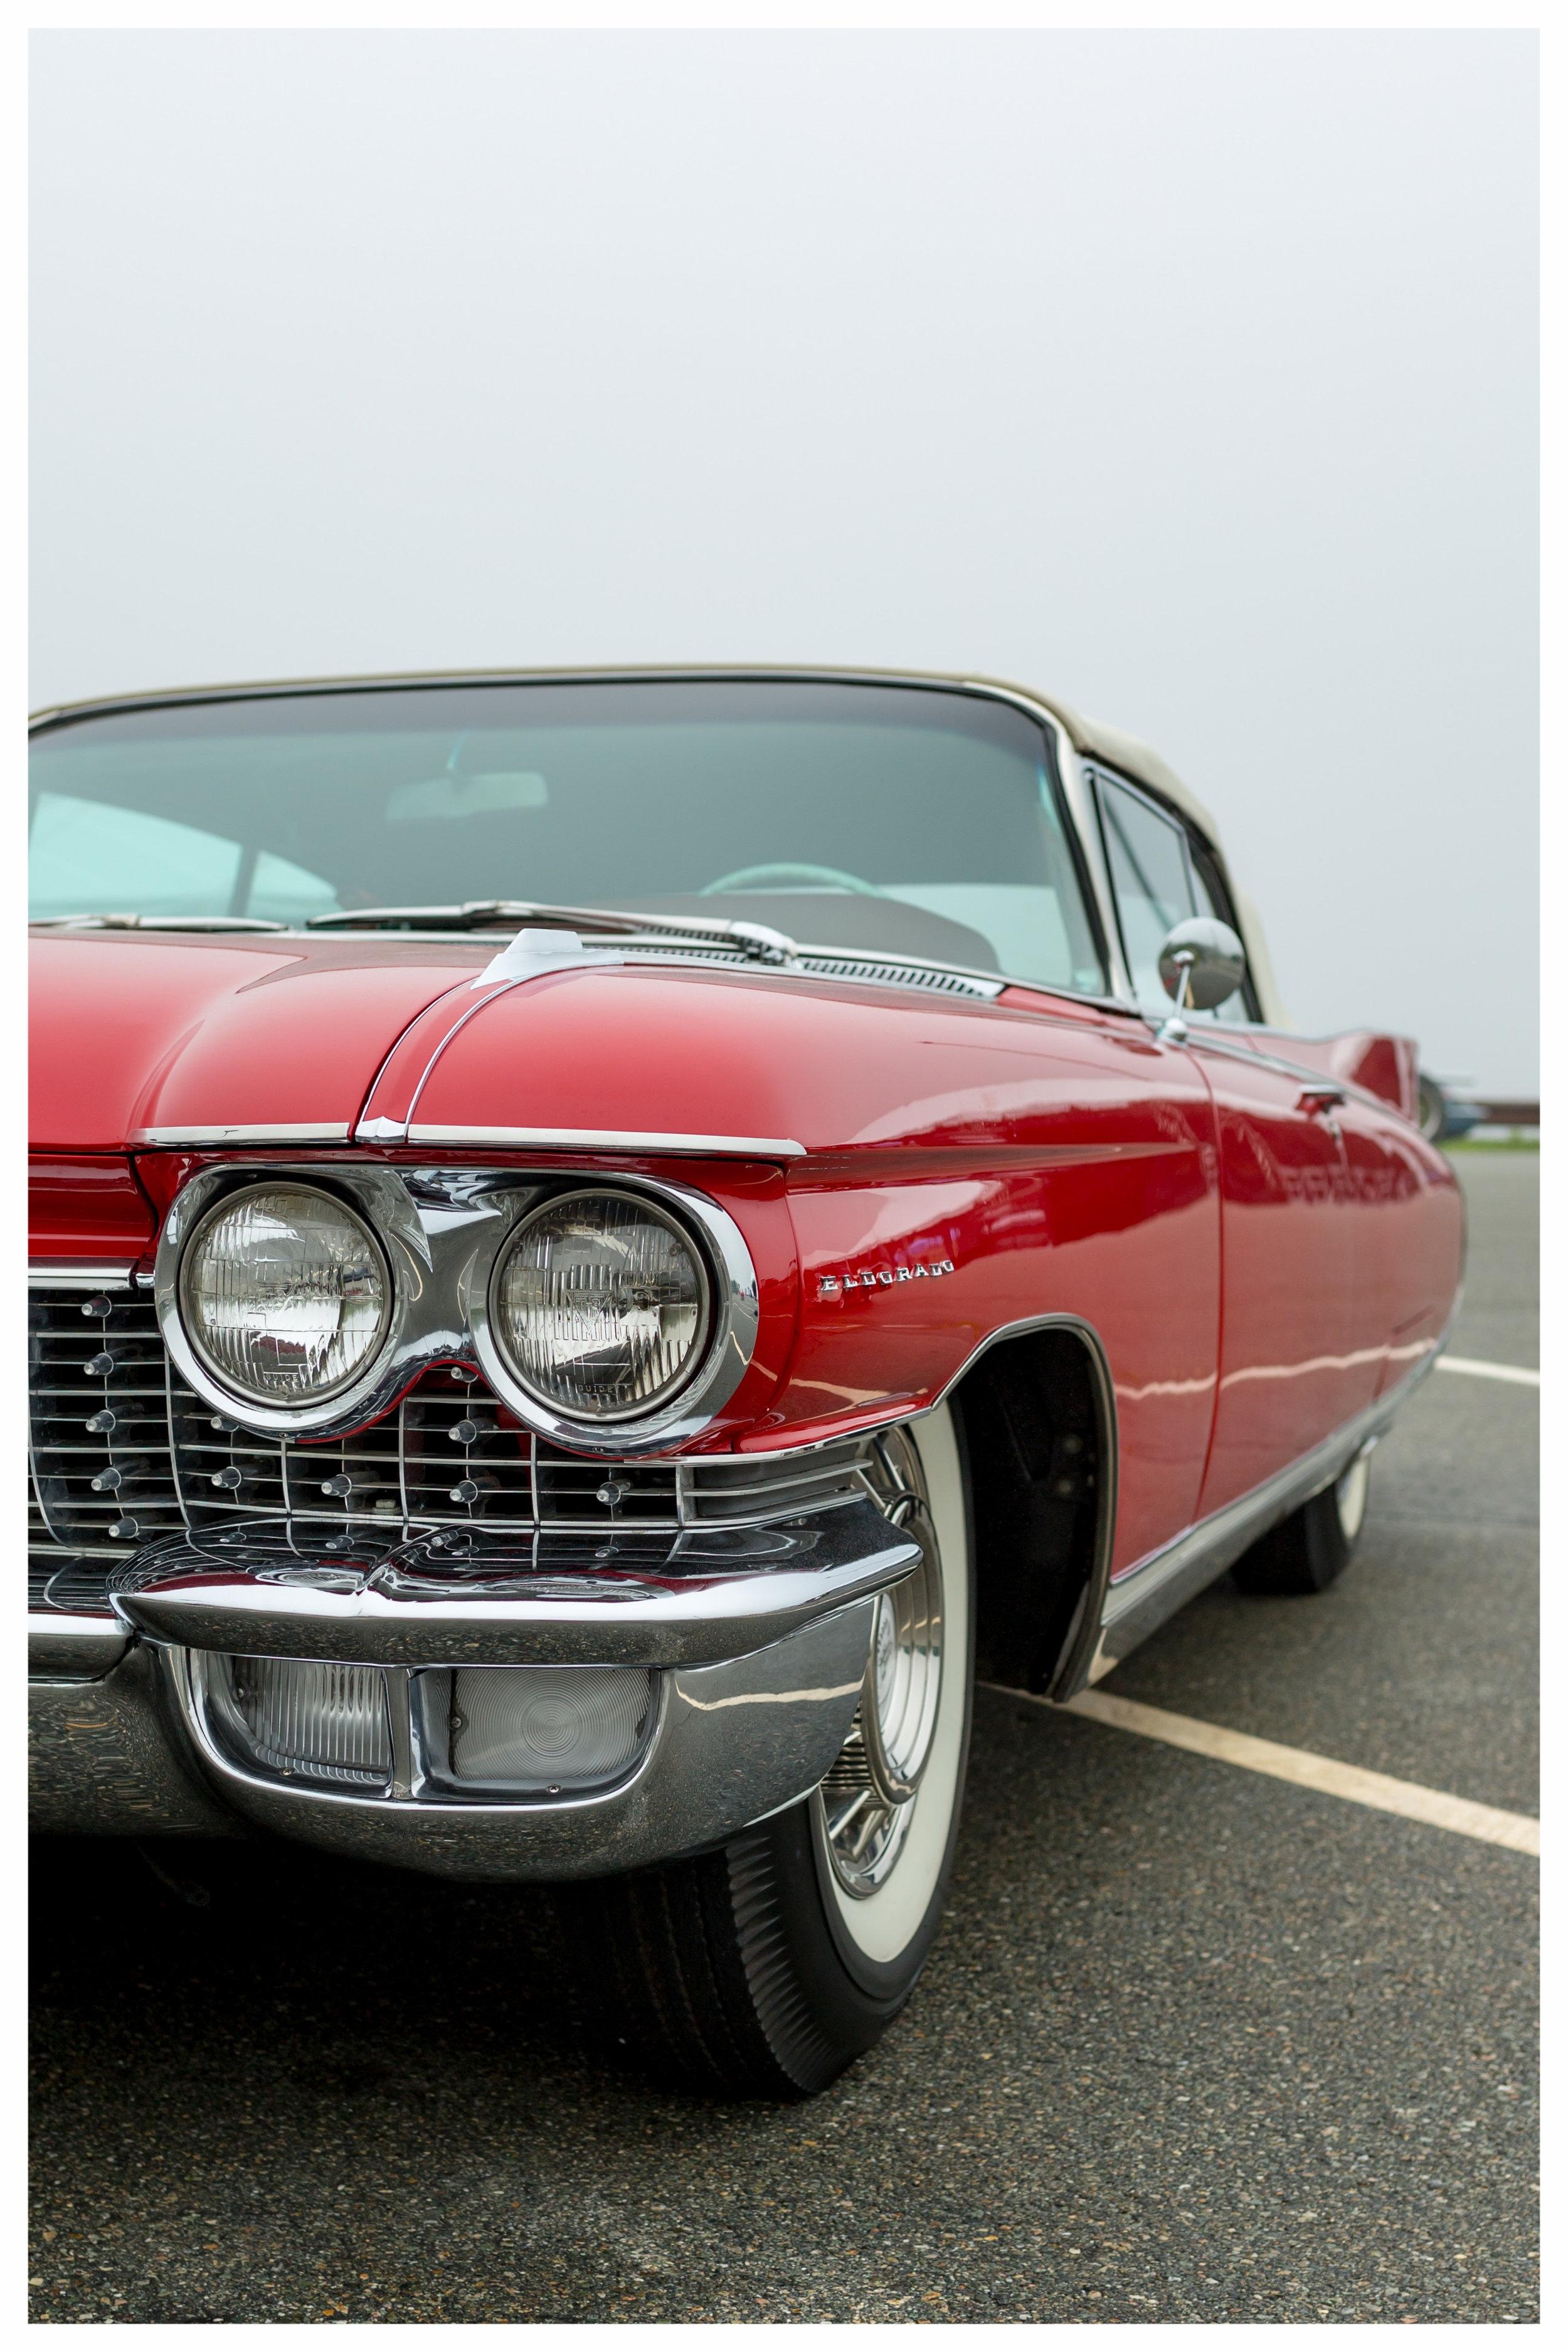 Barrett Jackson Car Show-2.jpg